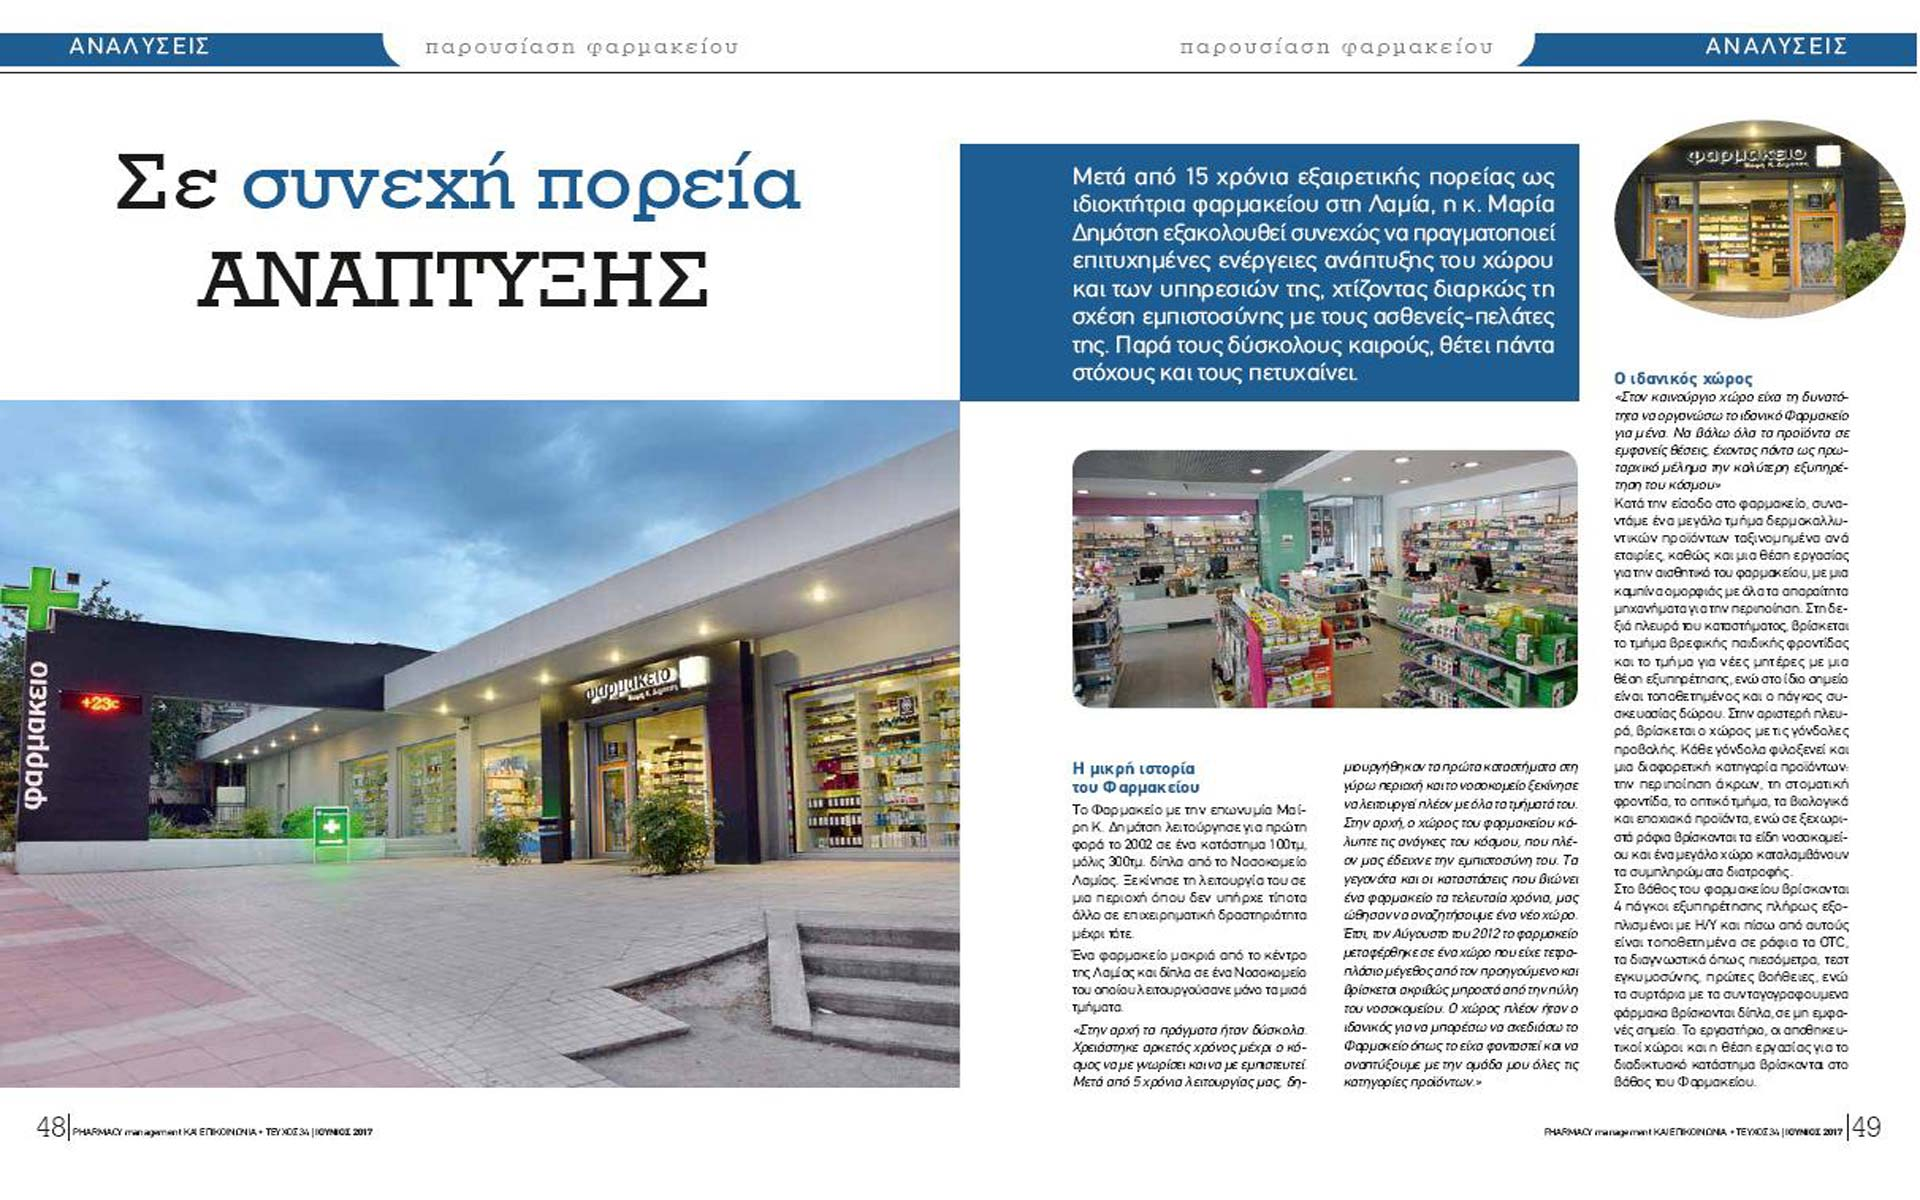 Dimotsi Pharmacy PHARMACY management 2017 - KDI CONTRACT